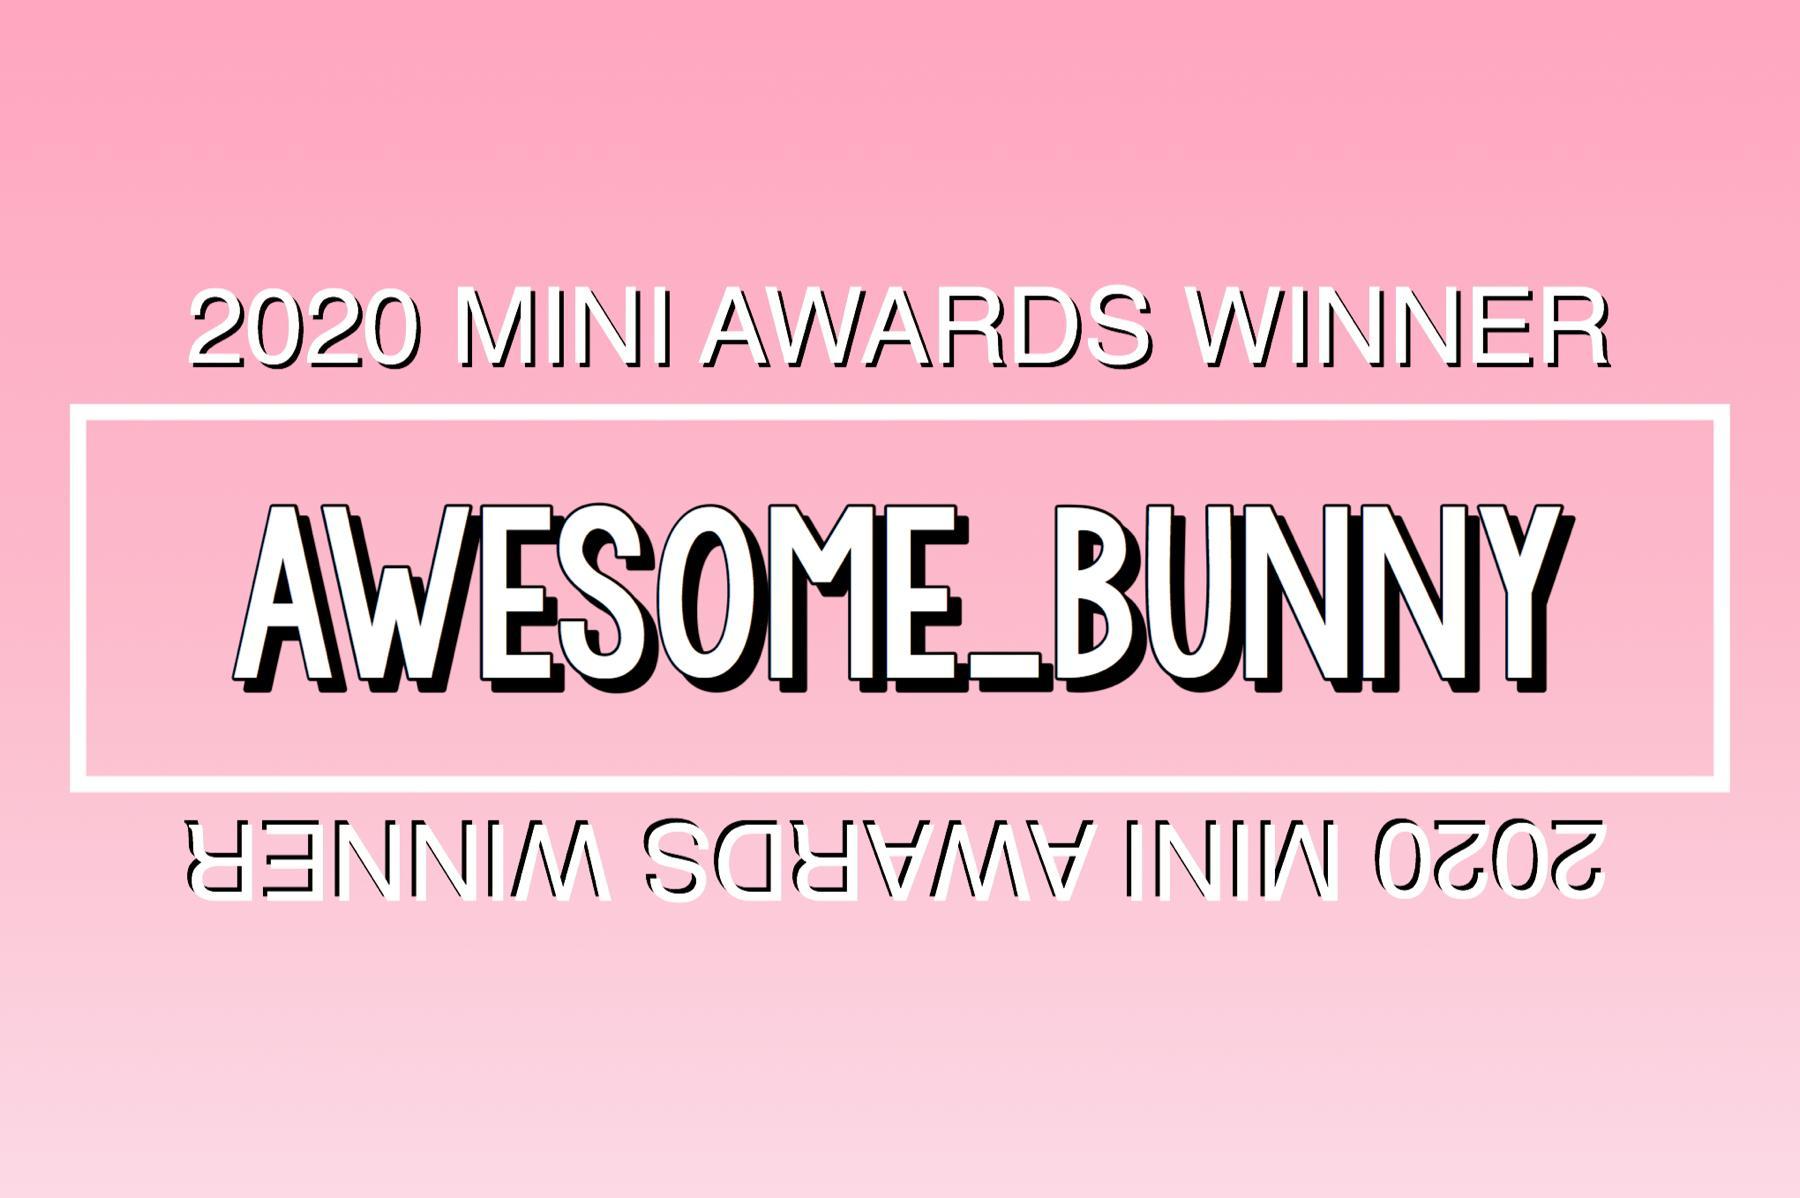 2020 Mini Awards Winner @Awesome_Bunny!